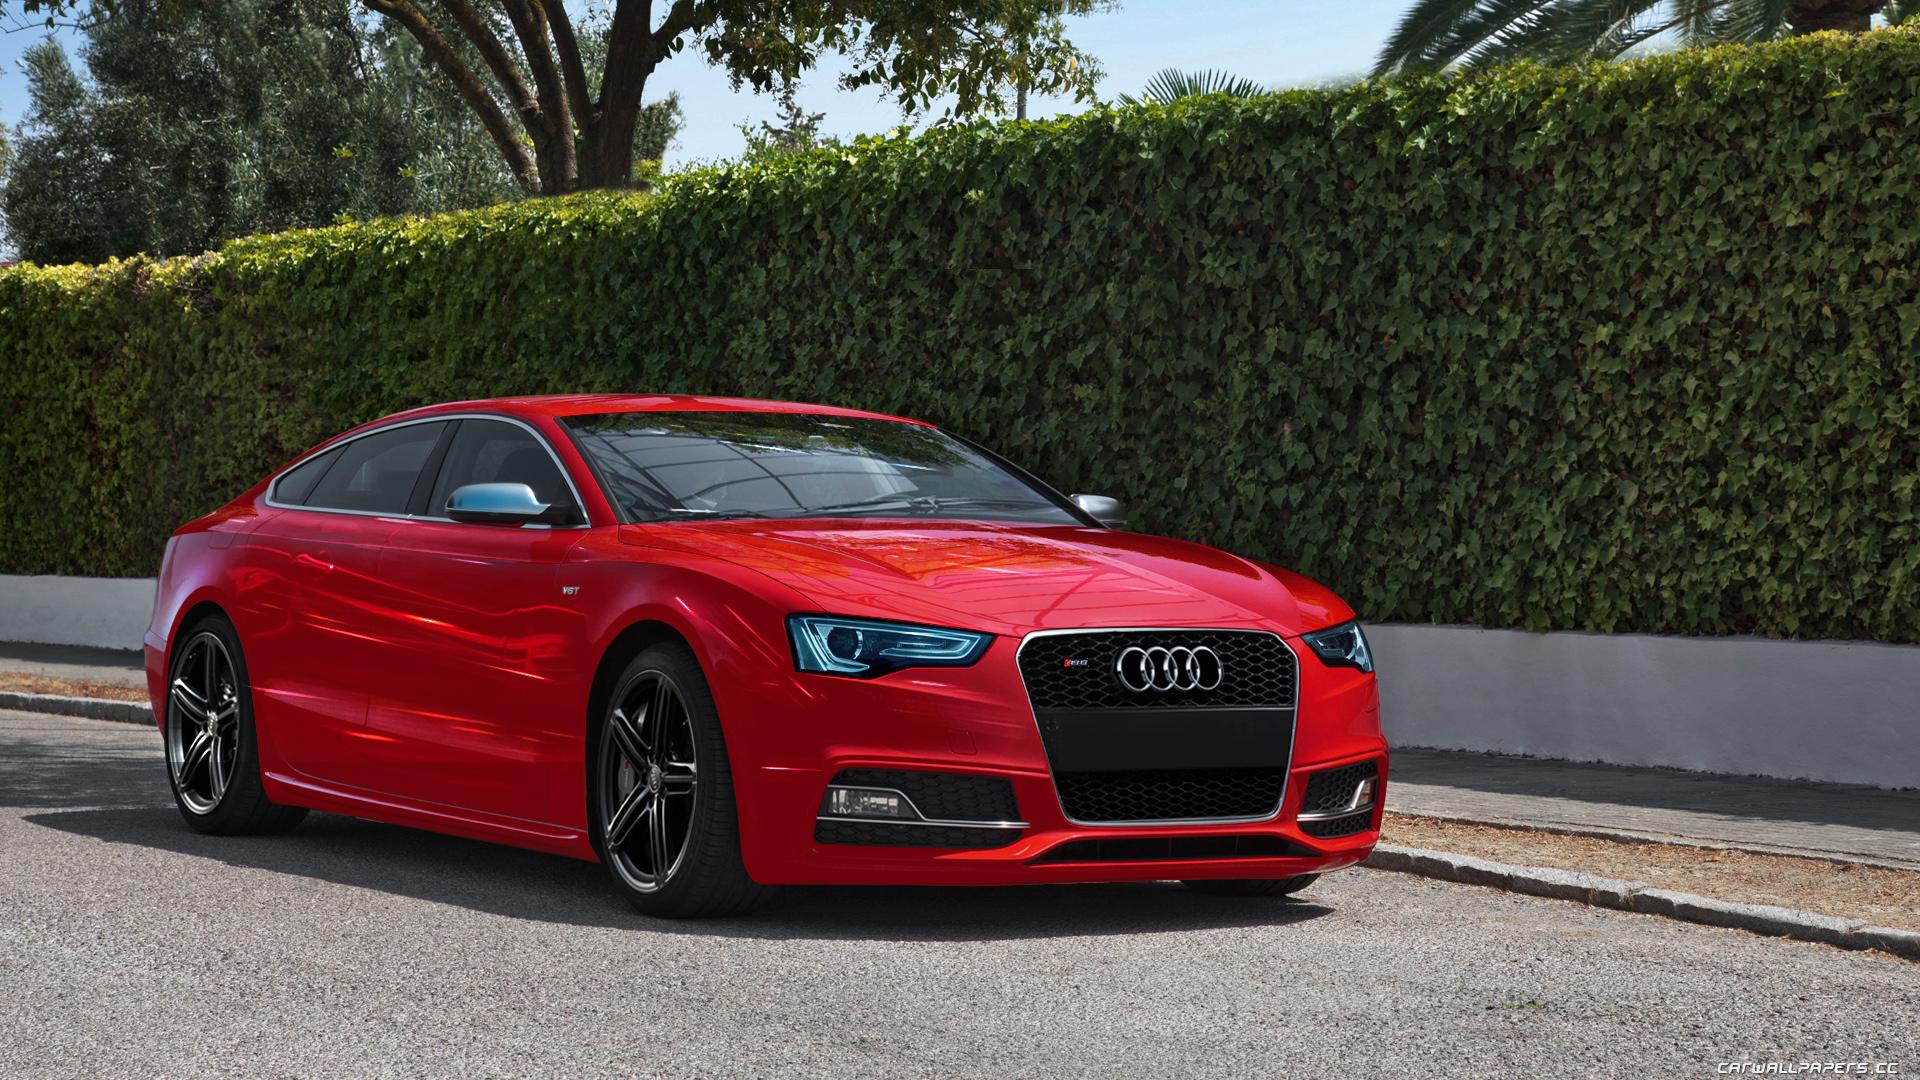 Red Audi S5 by backOPS